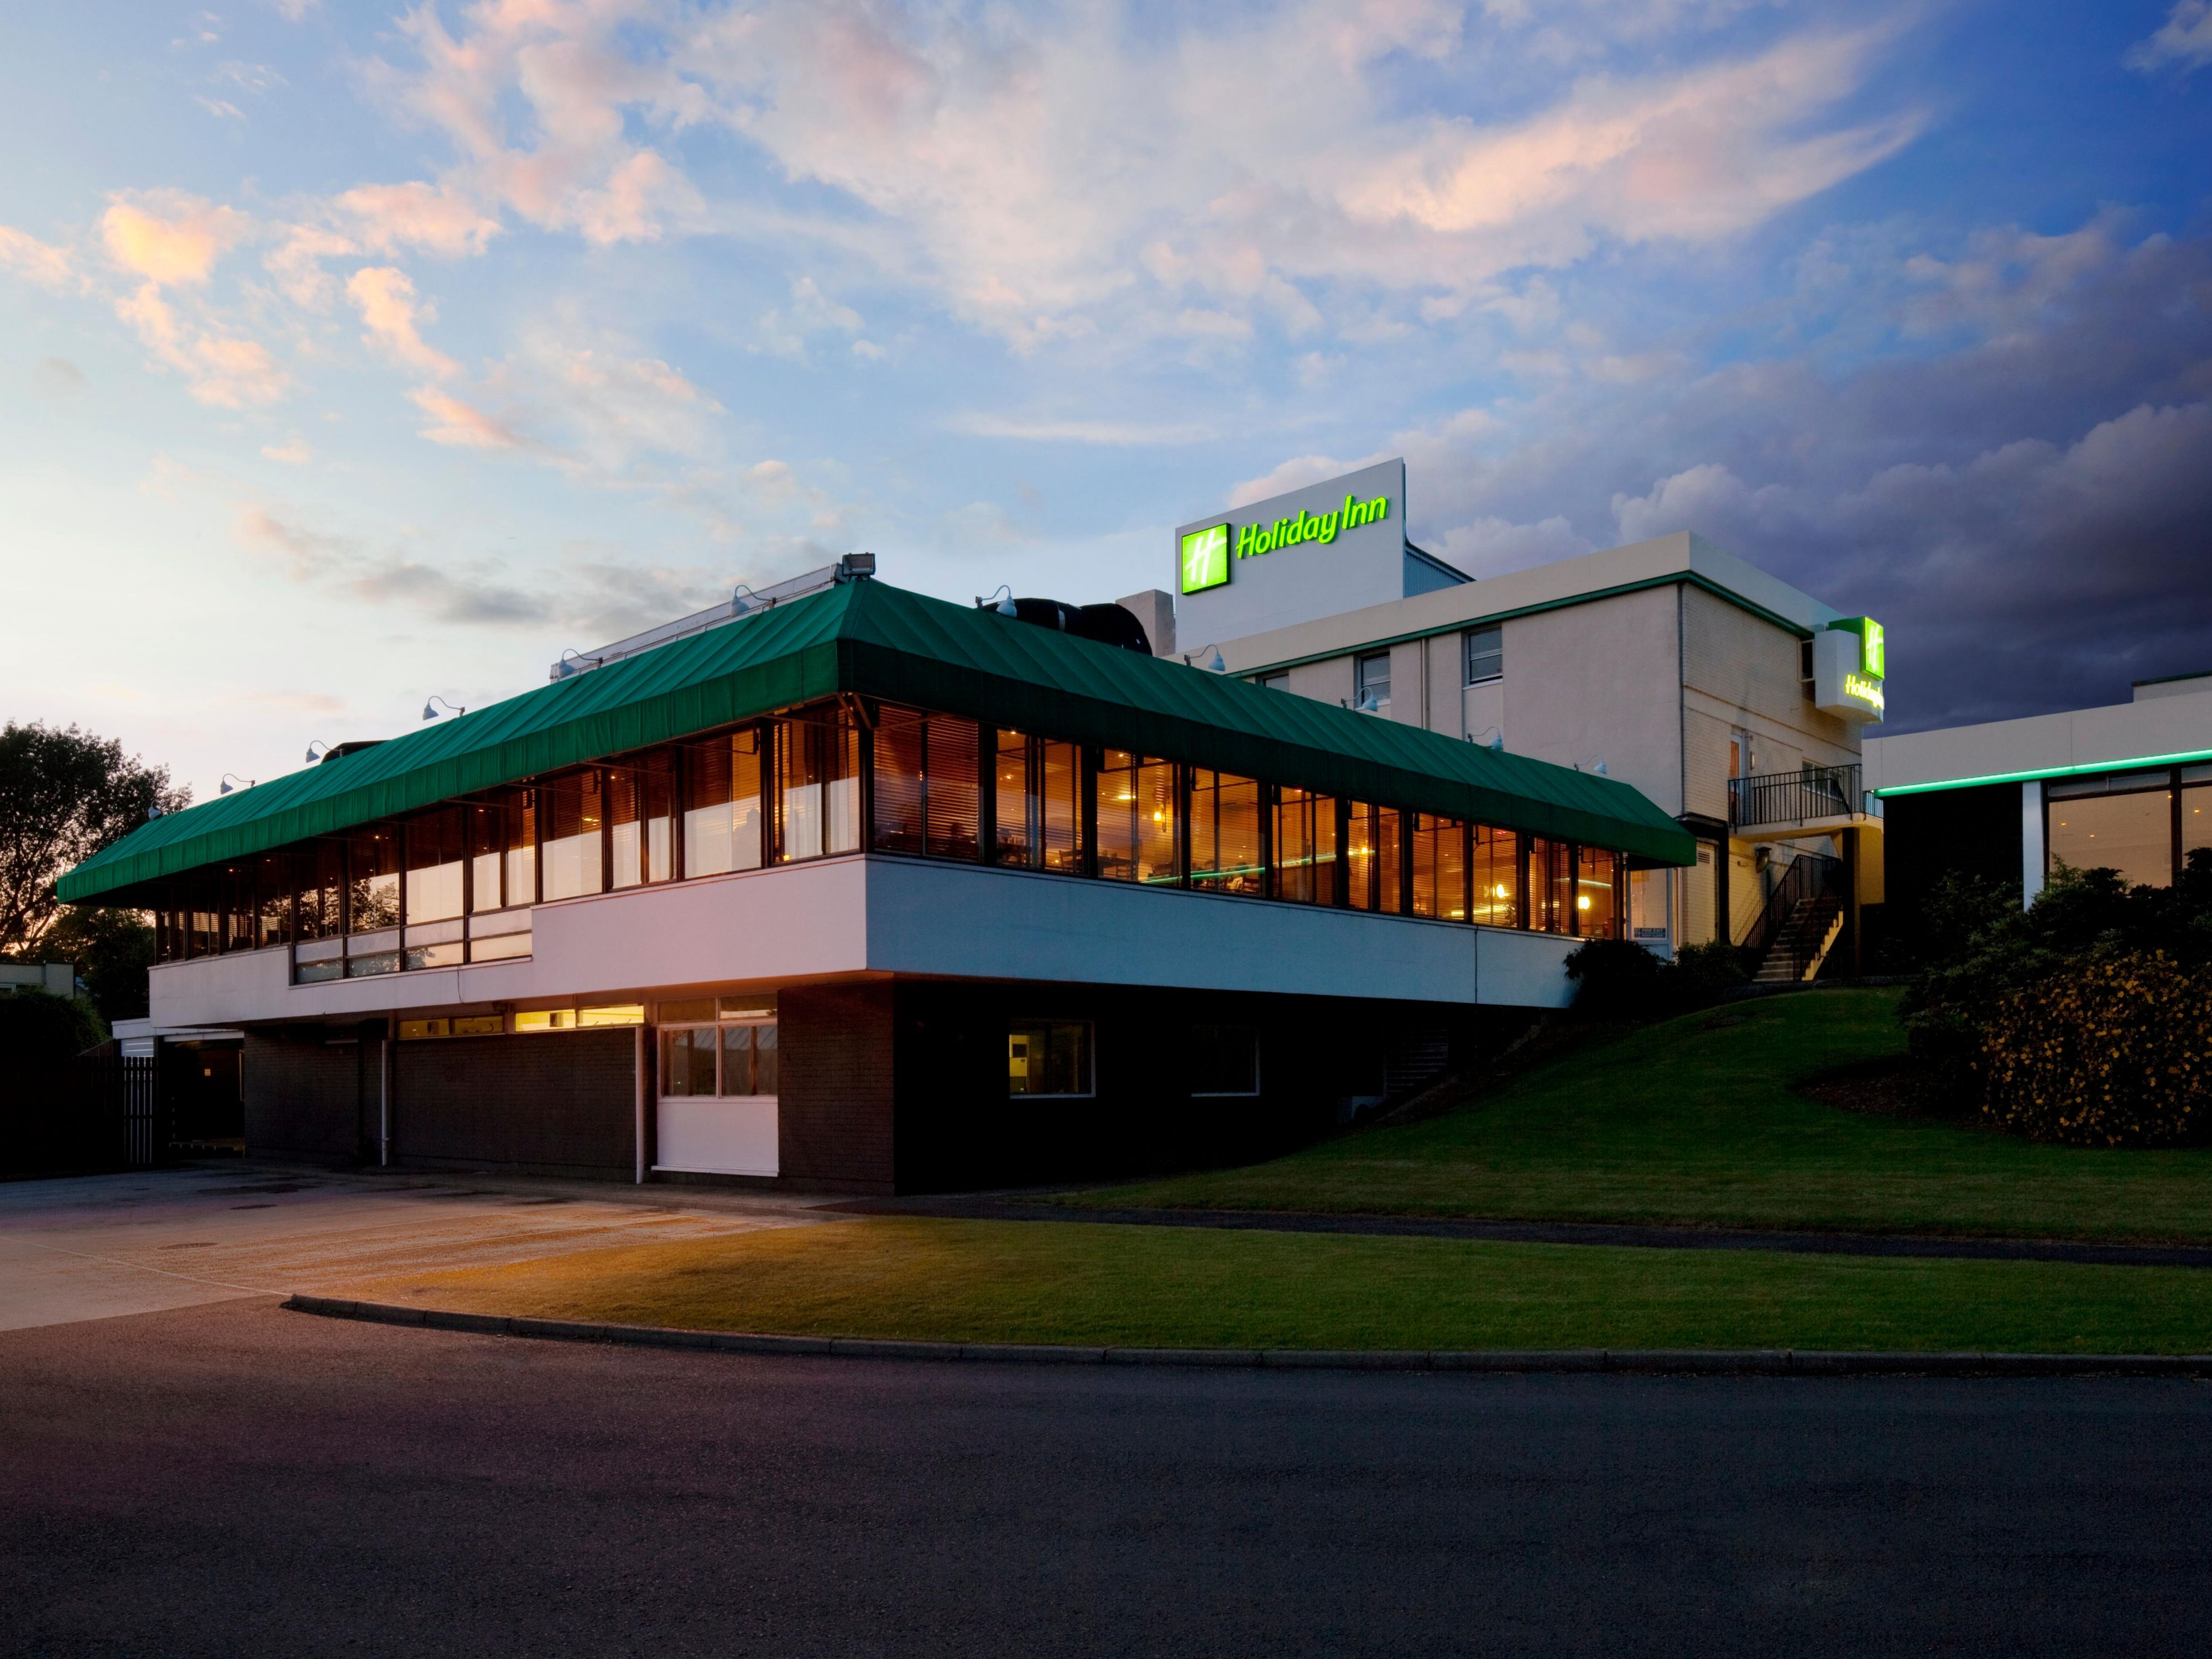 Holiday Inn Newcastle Under Lyme Hotels Holiday Inn